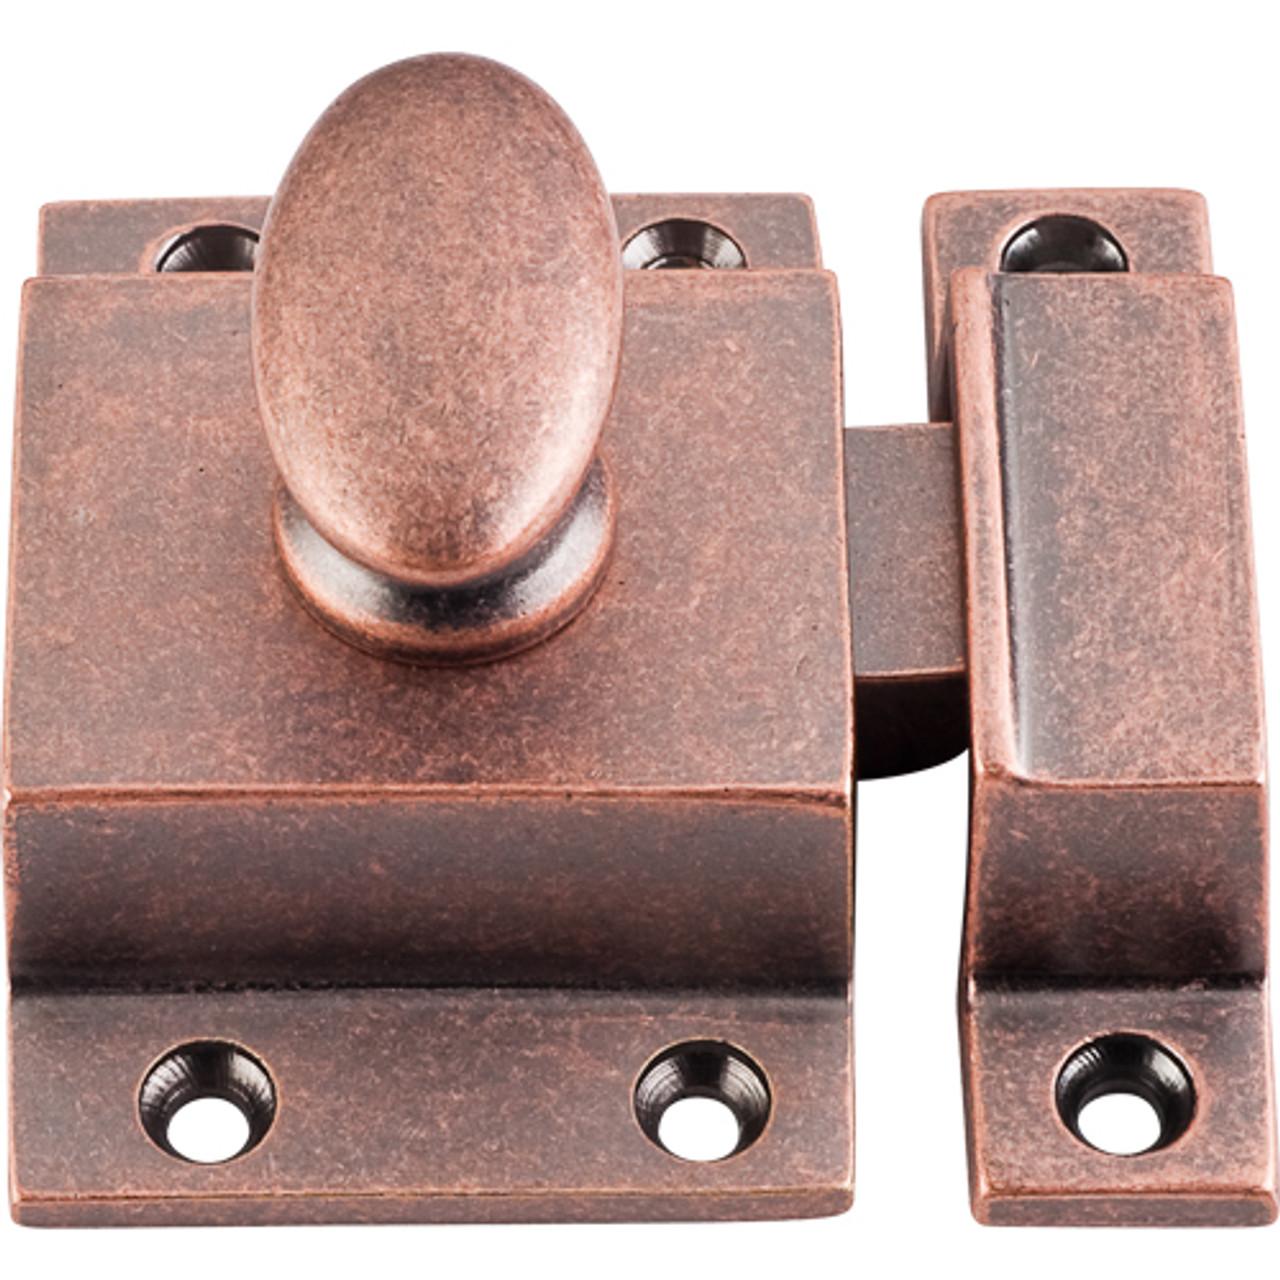 "Vintage Forged Iron Cabinet Latch Copper Metal Hammered Design 3//8"" Offset"